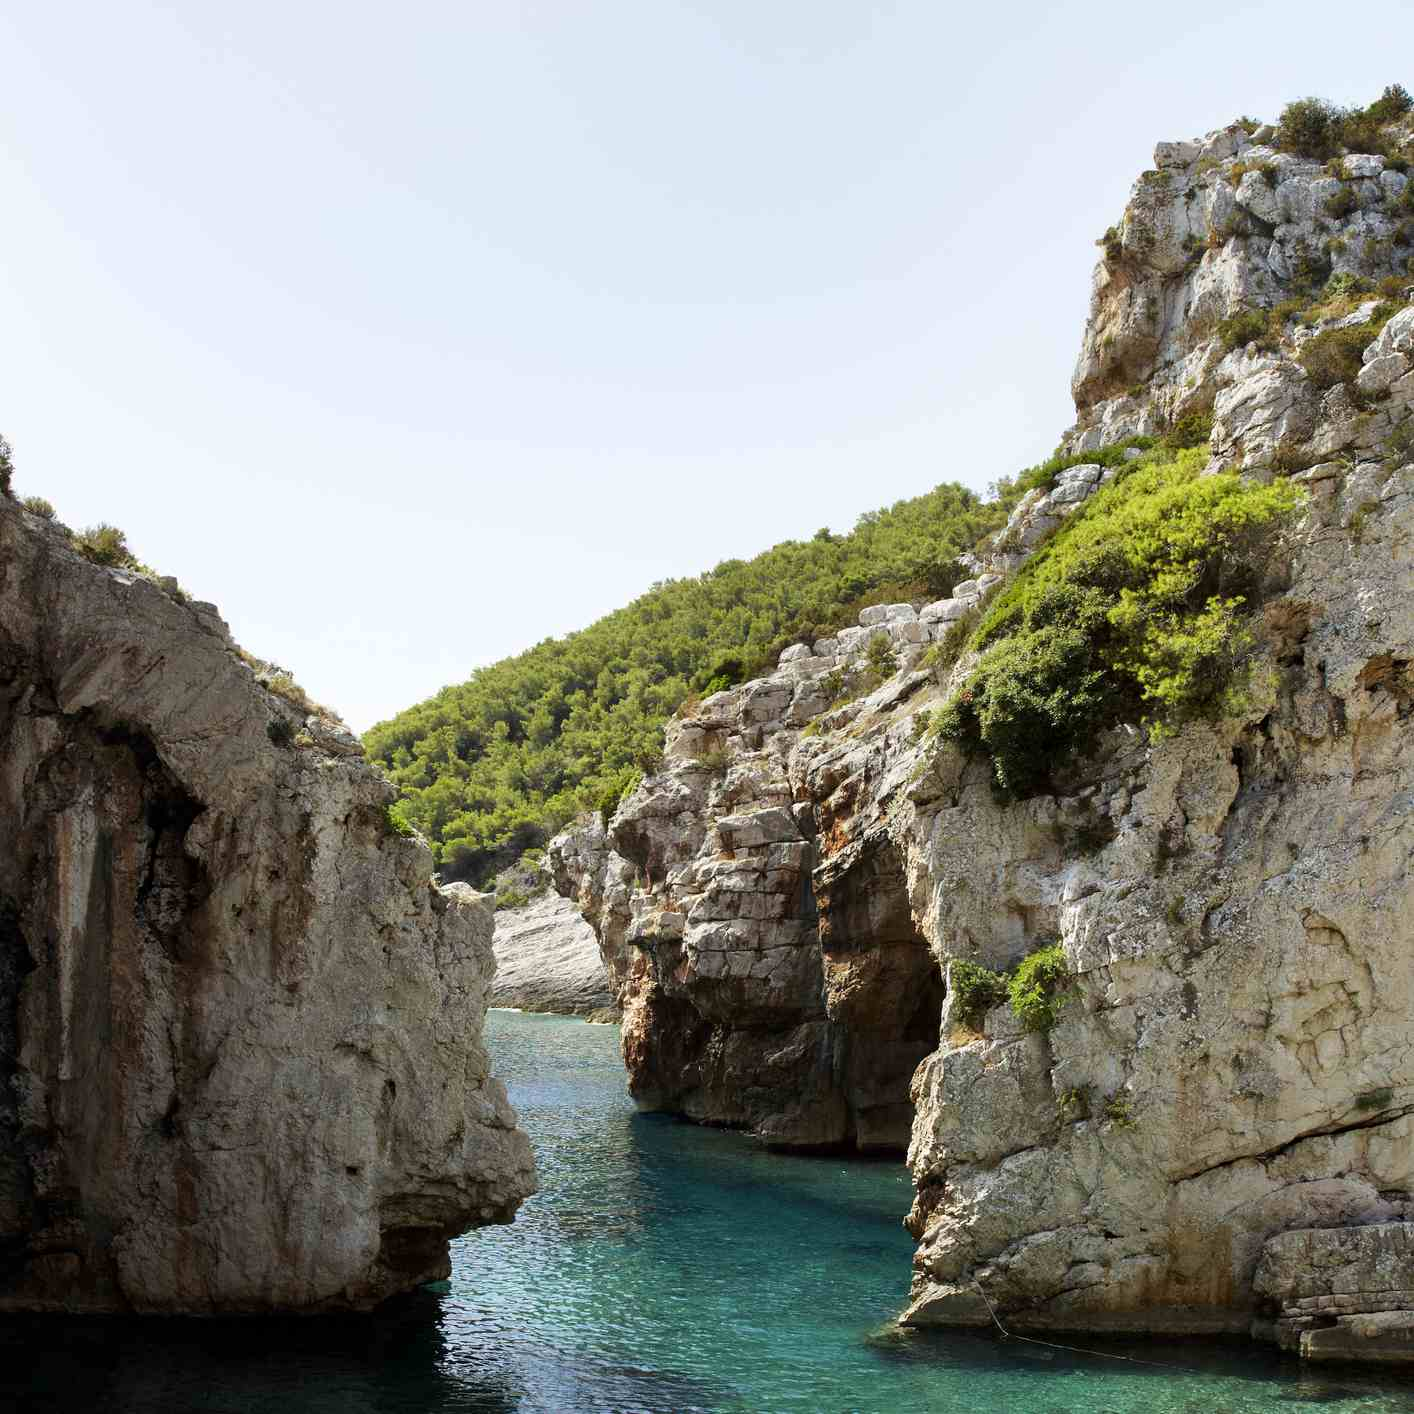 Stiniva Cove on the island of Vis, Croatia